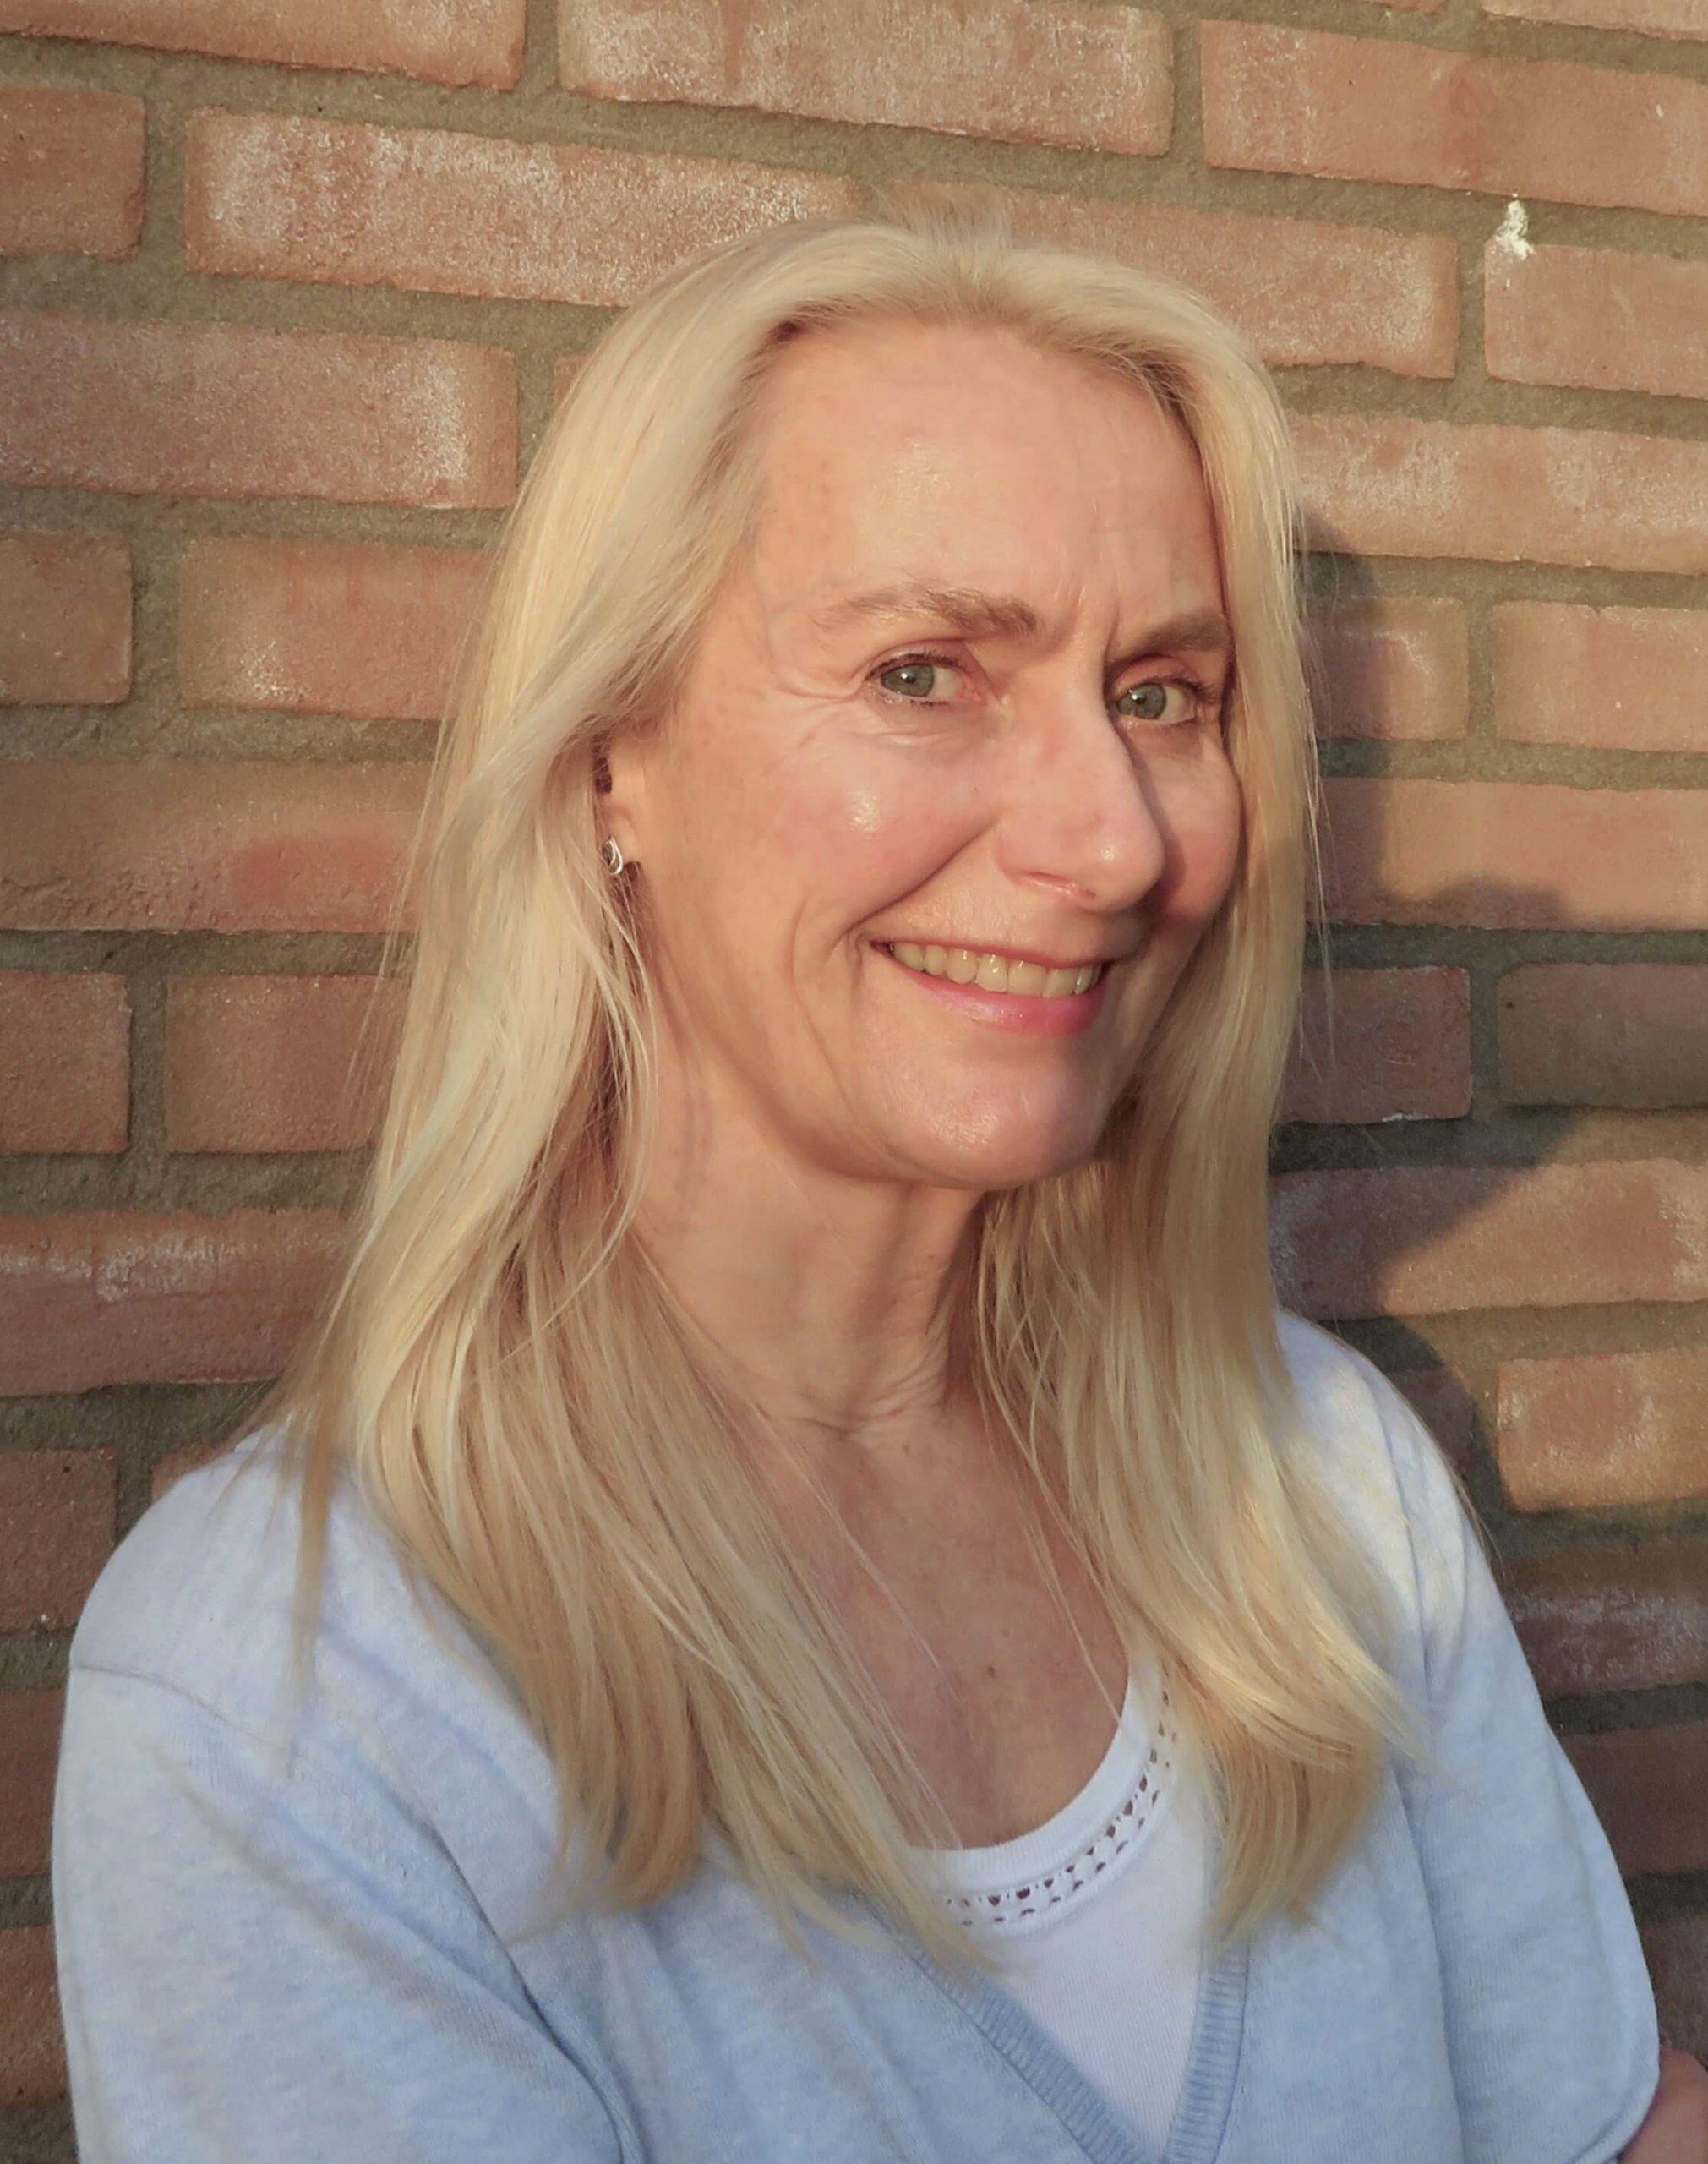 Lilian Buckx